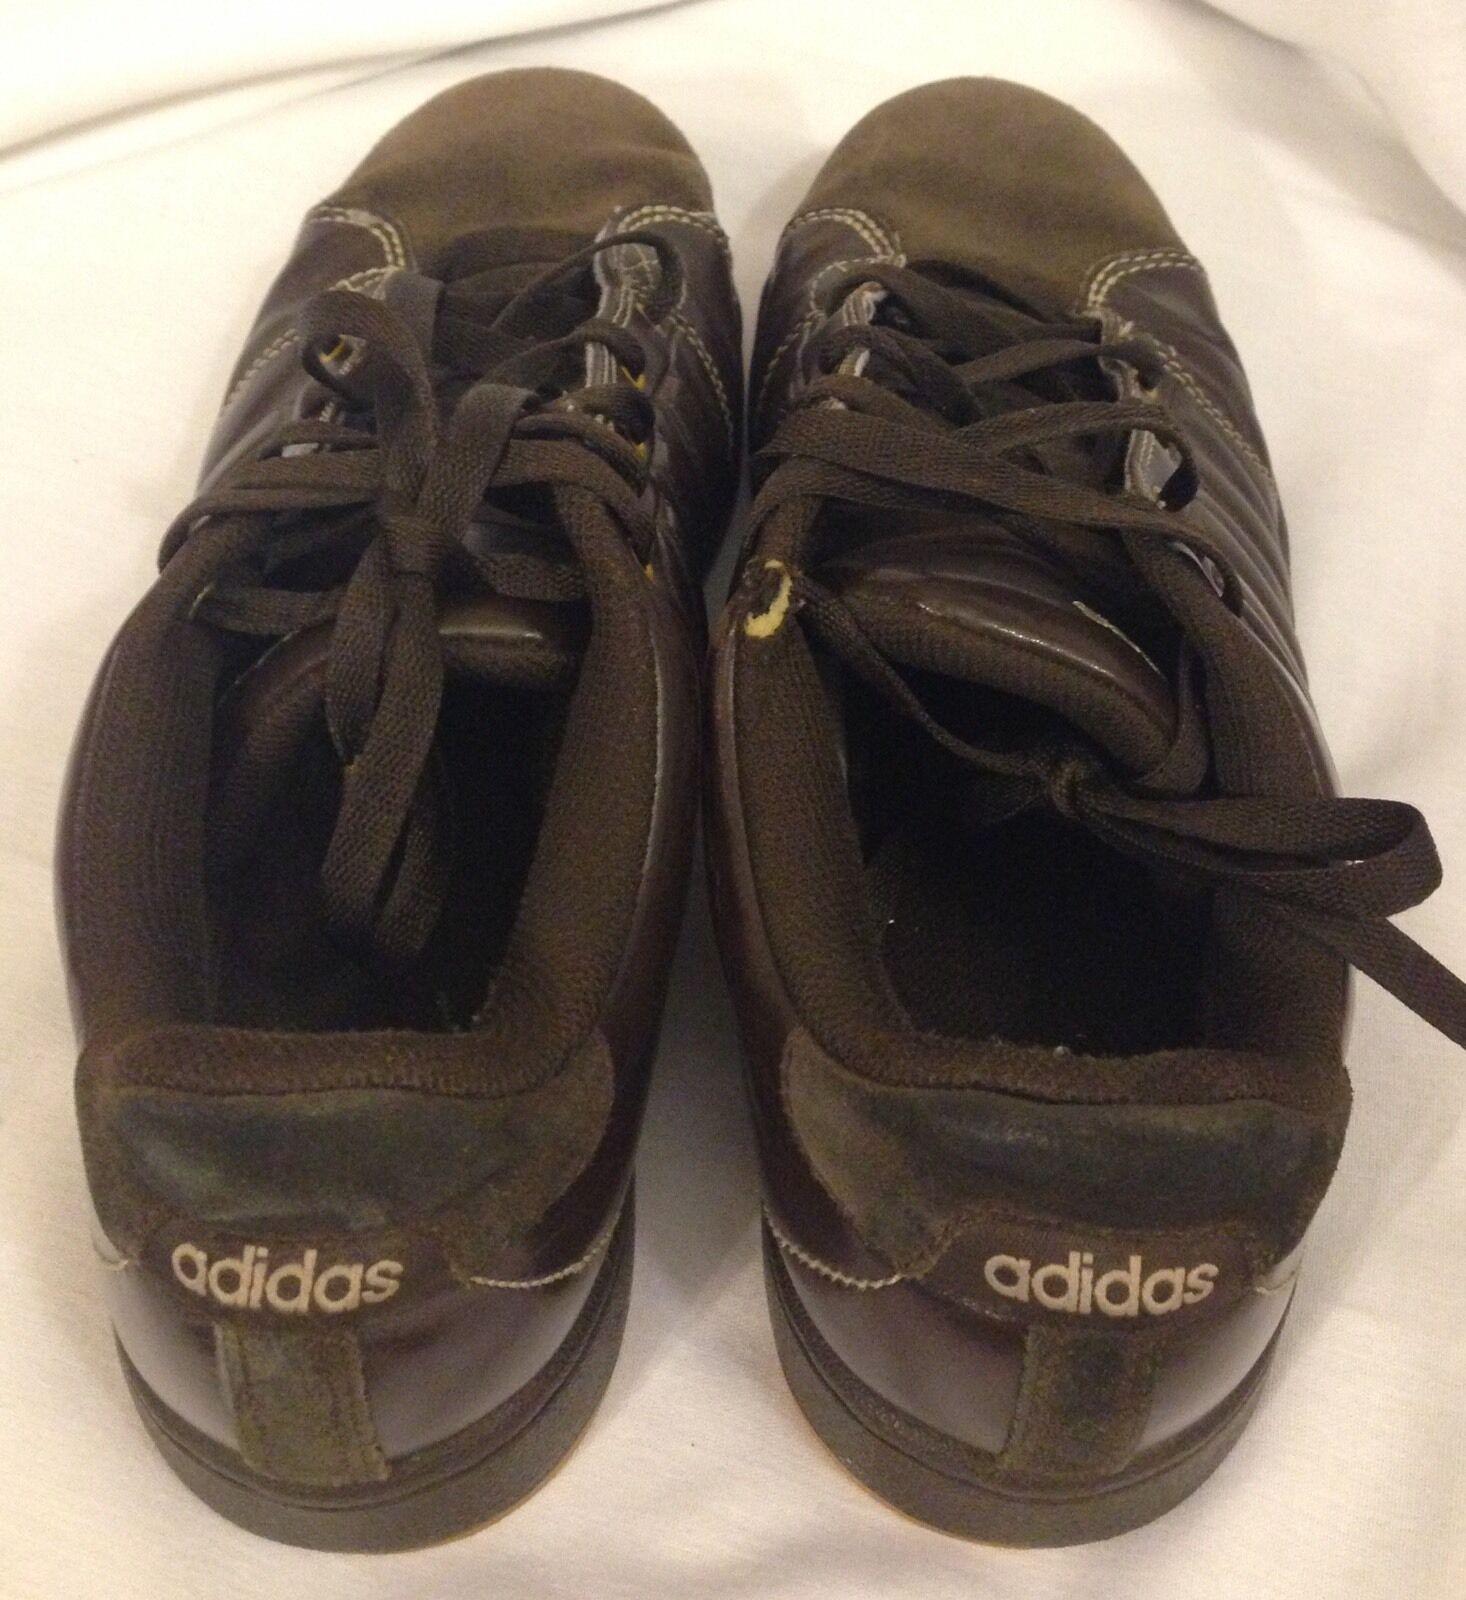 Brun 9 Cuir Adidas Taille De Chaussures 5 Rares 0Xpqt